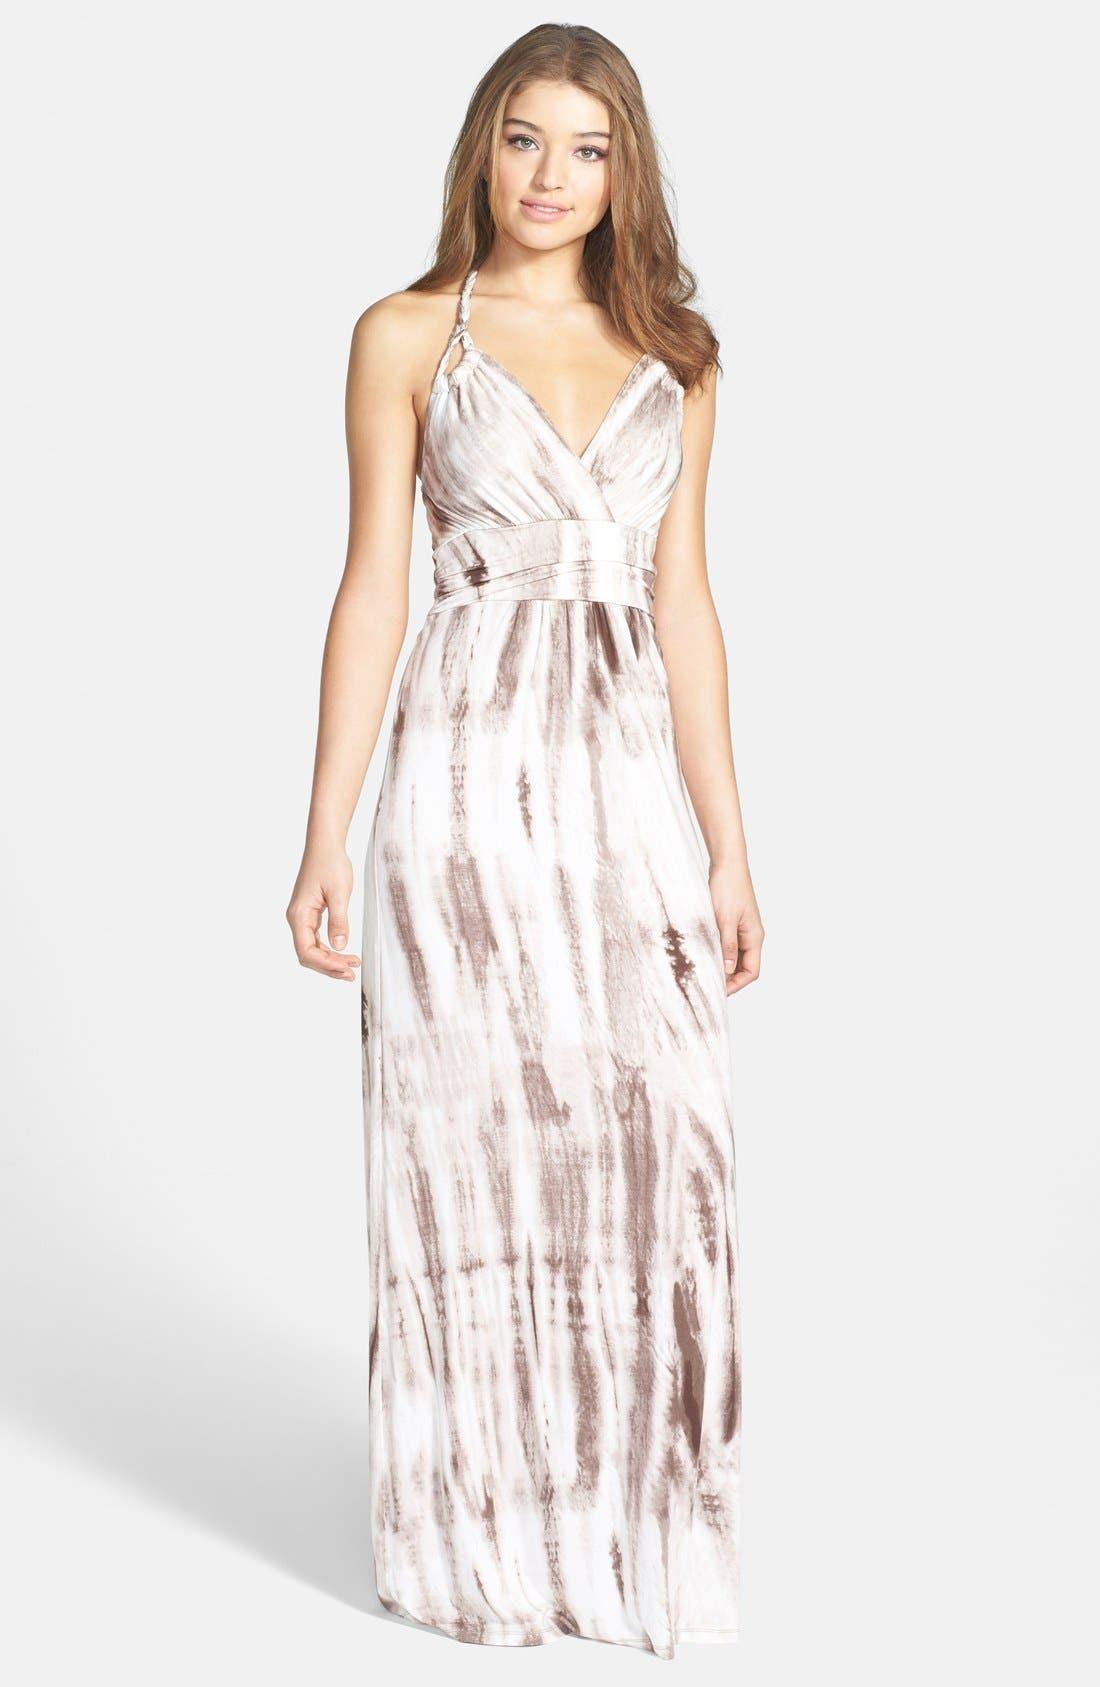 Alternate Image 1 Selected - Felicity & Coco Tie Dye Jersey Halter Maxi Dress (Nordstrom Exclusive)